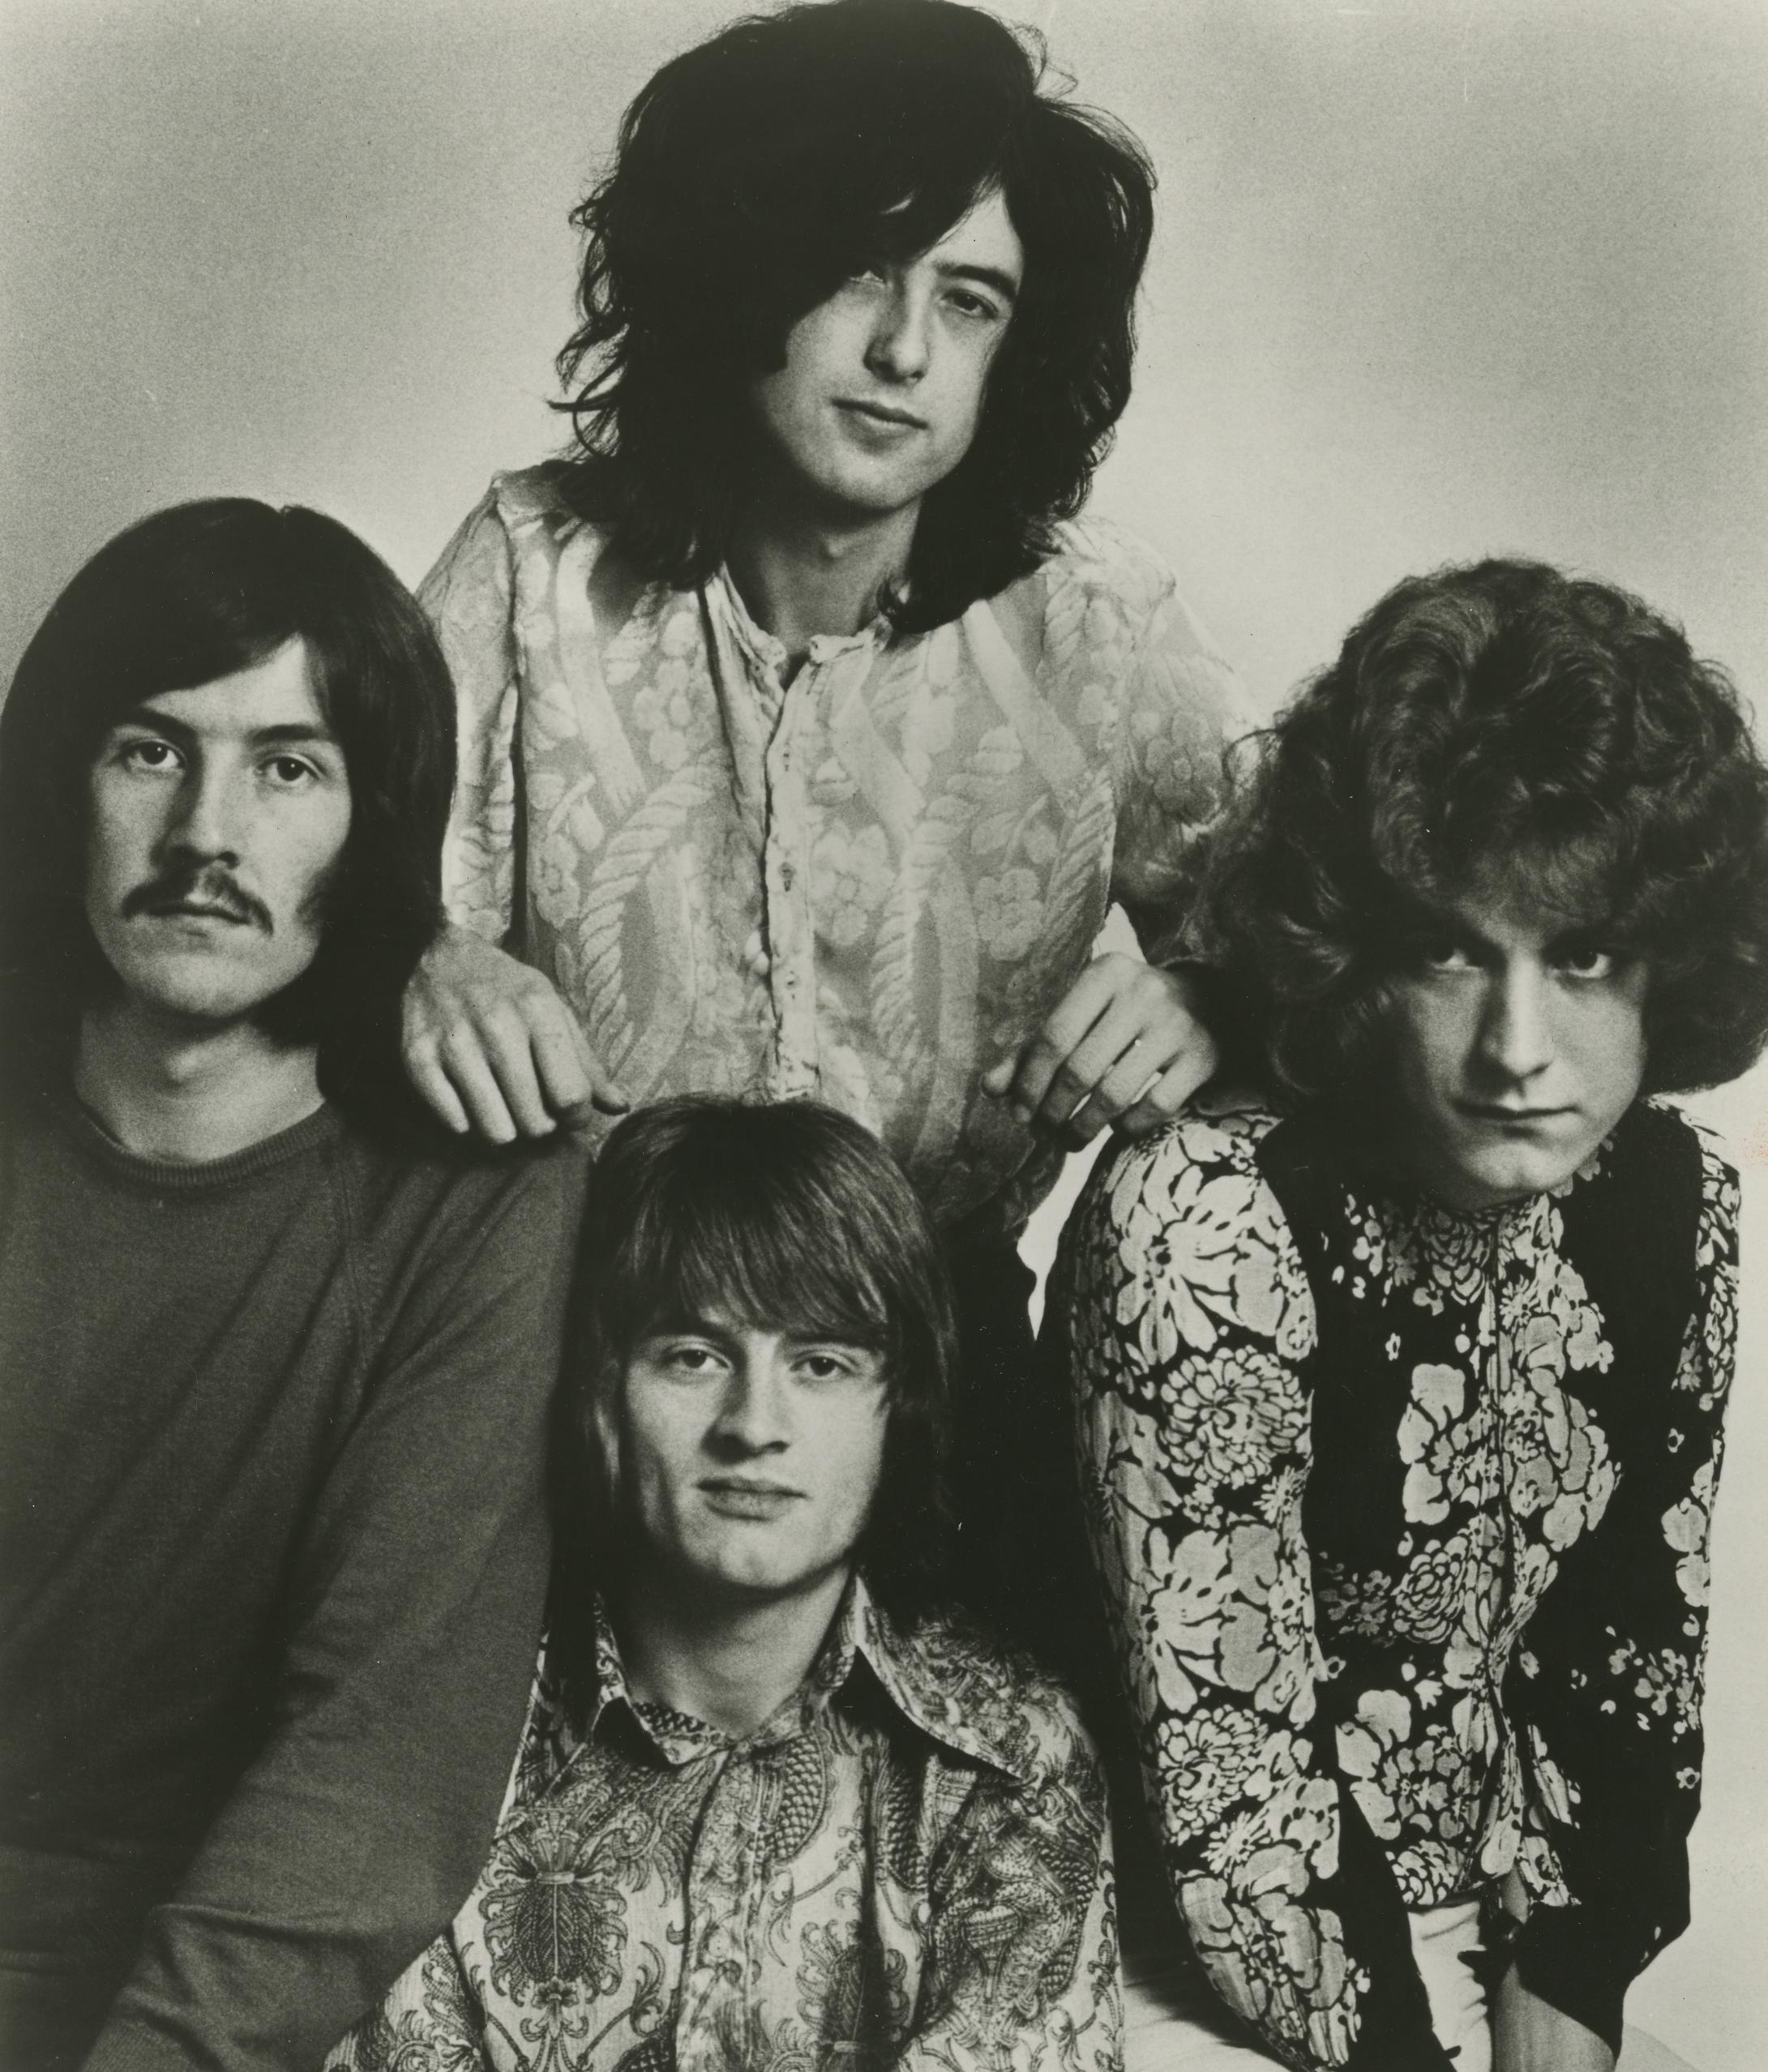 La banda. John Bonhan, Robert Plant, Jimmy Page y John Paul Jones